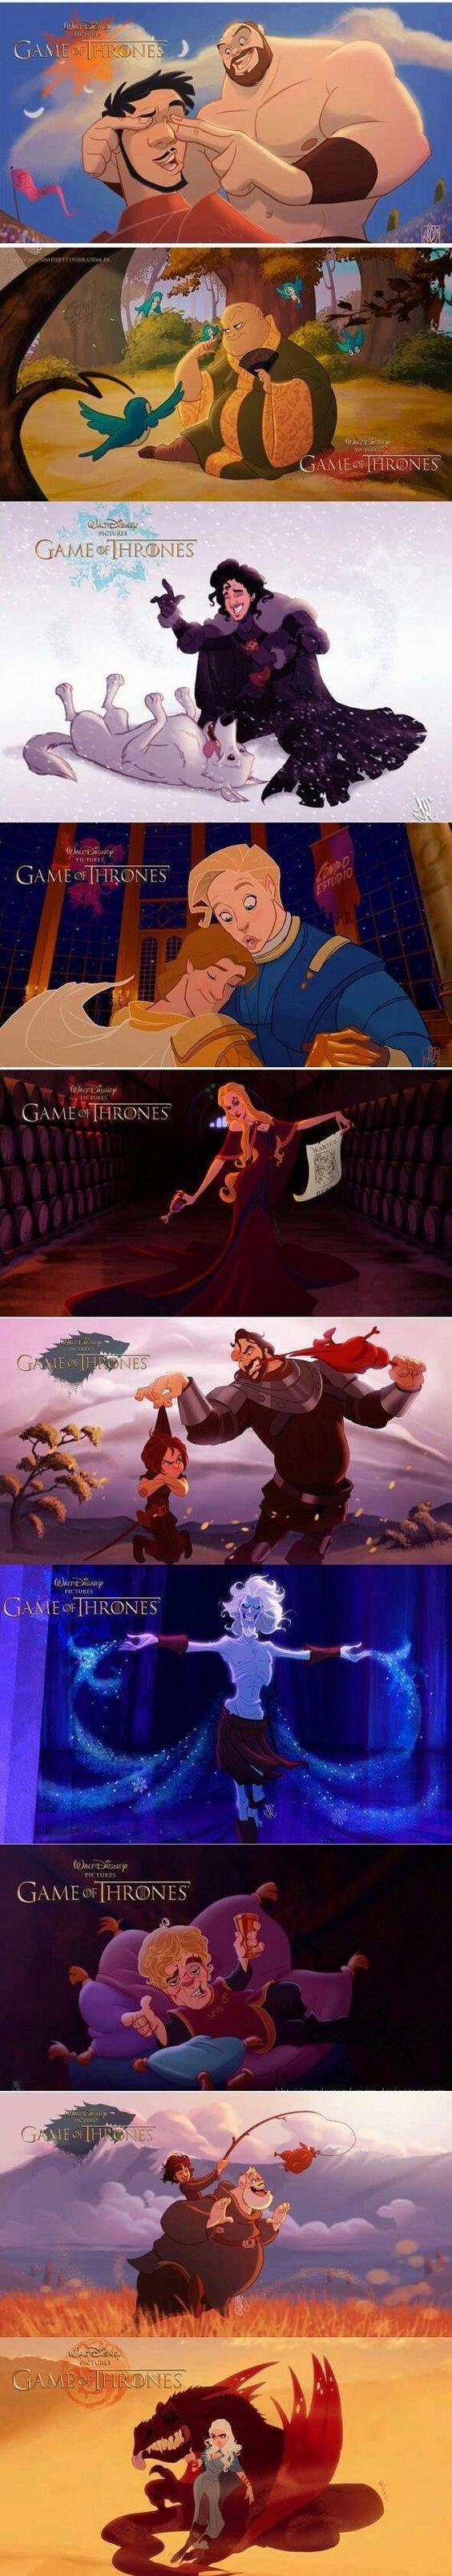 Disney's Game of Thrones (By Nandomendonssa) - 9GAG: